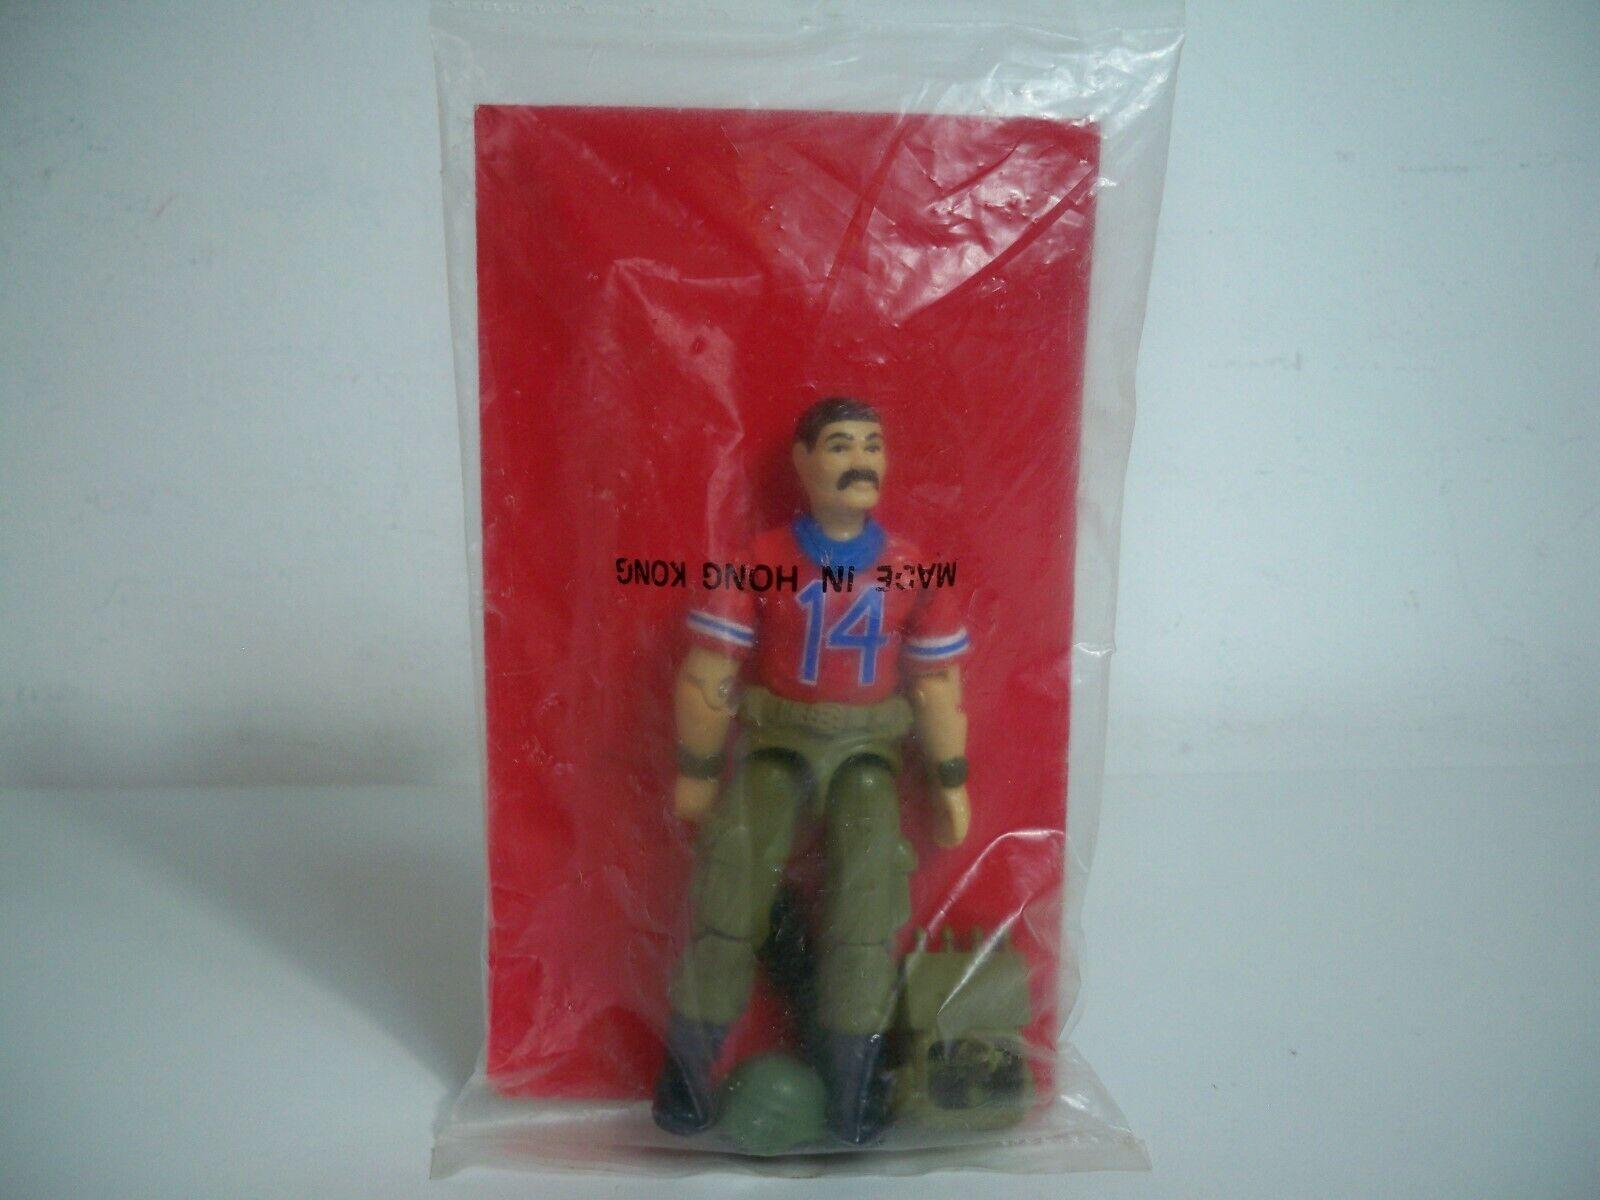 K1984011 BAZOOKA MAILAWAY FACTORY SEALED Tasche rot BACK 1988 GI JOE VINTAGE